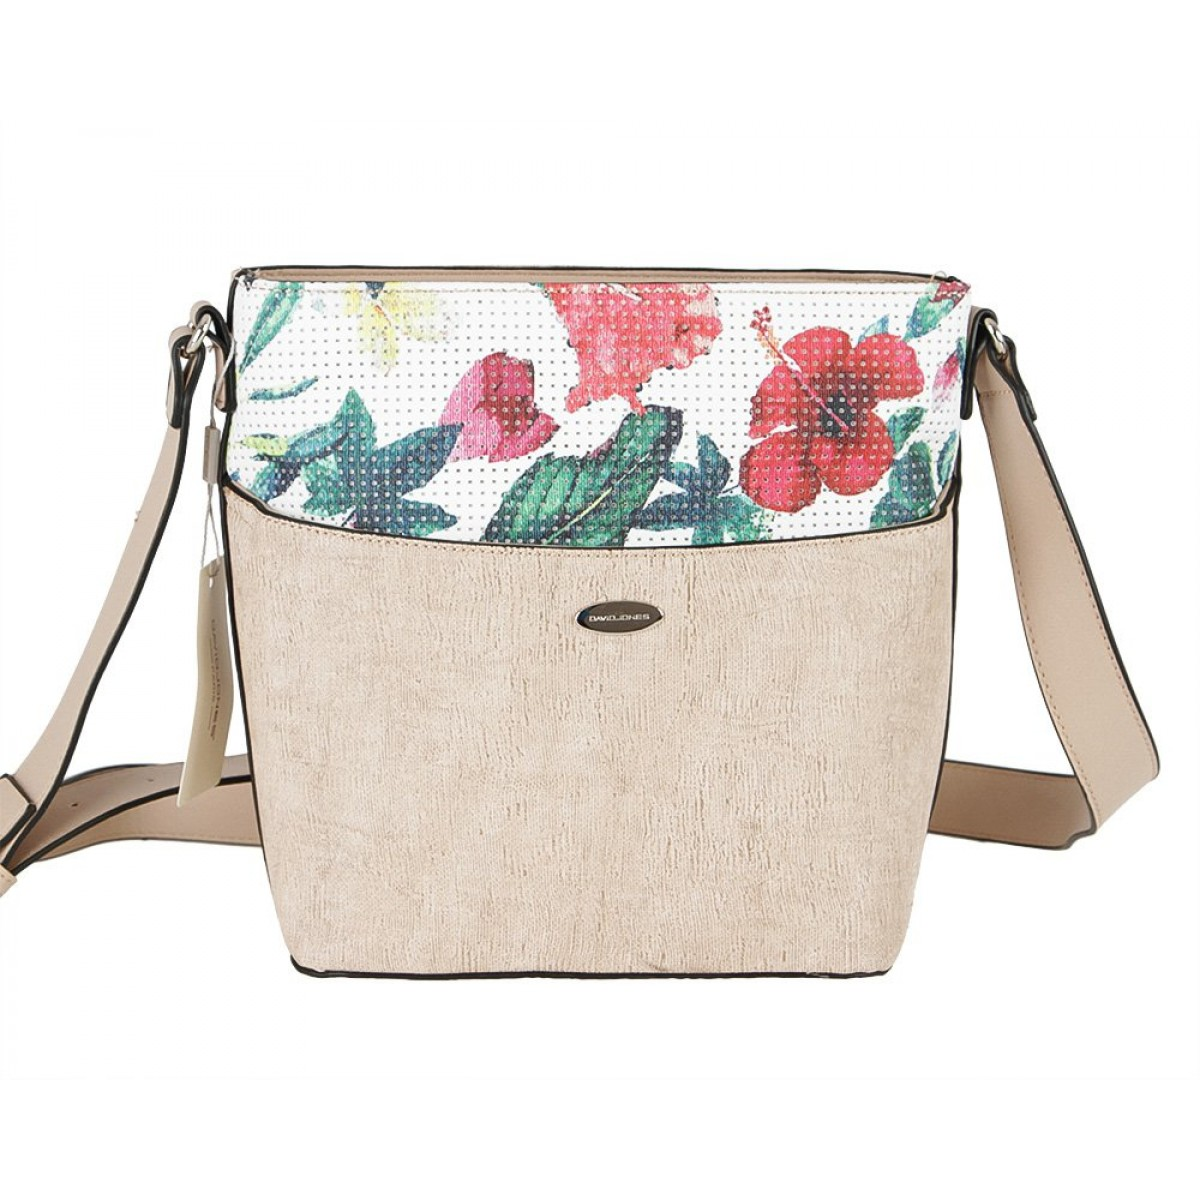 Жіноча сумка David Jones 6298-1 BEIGE